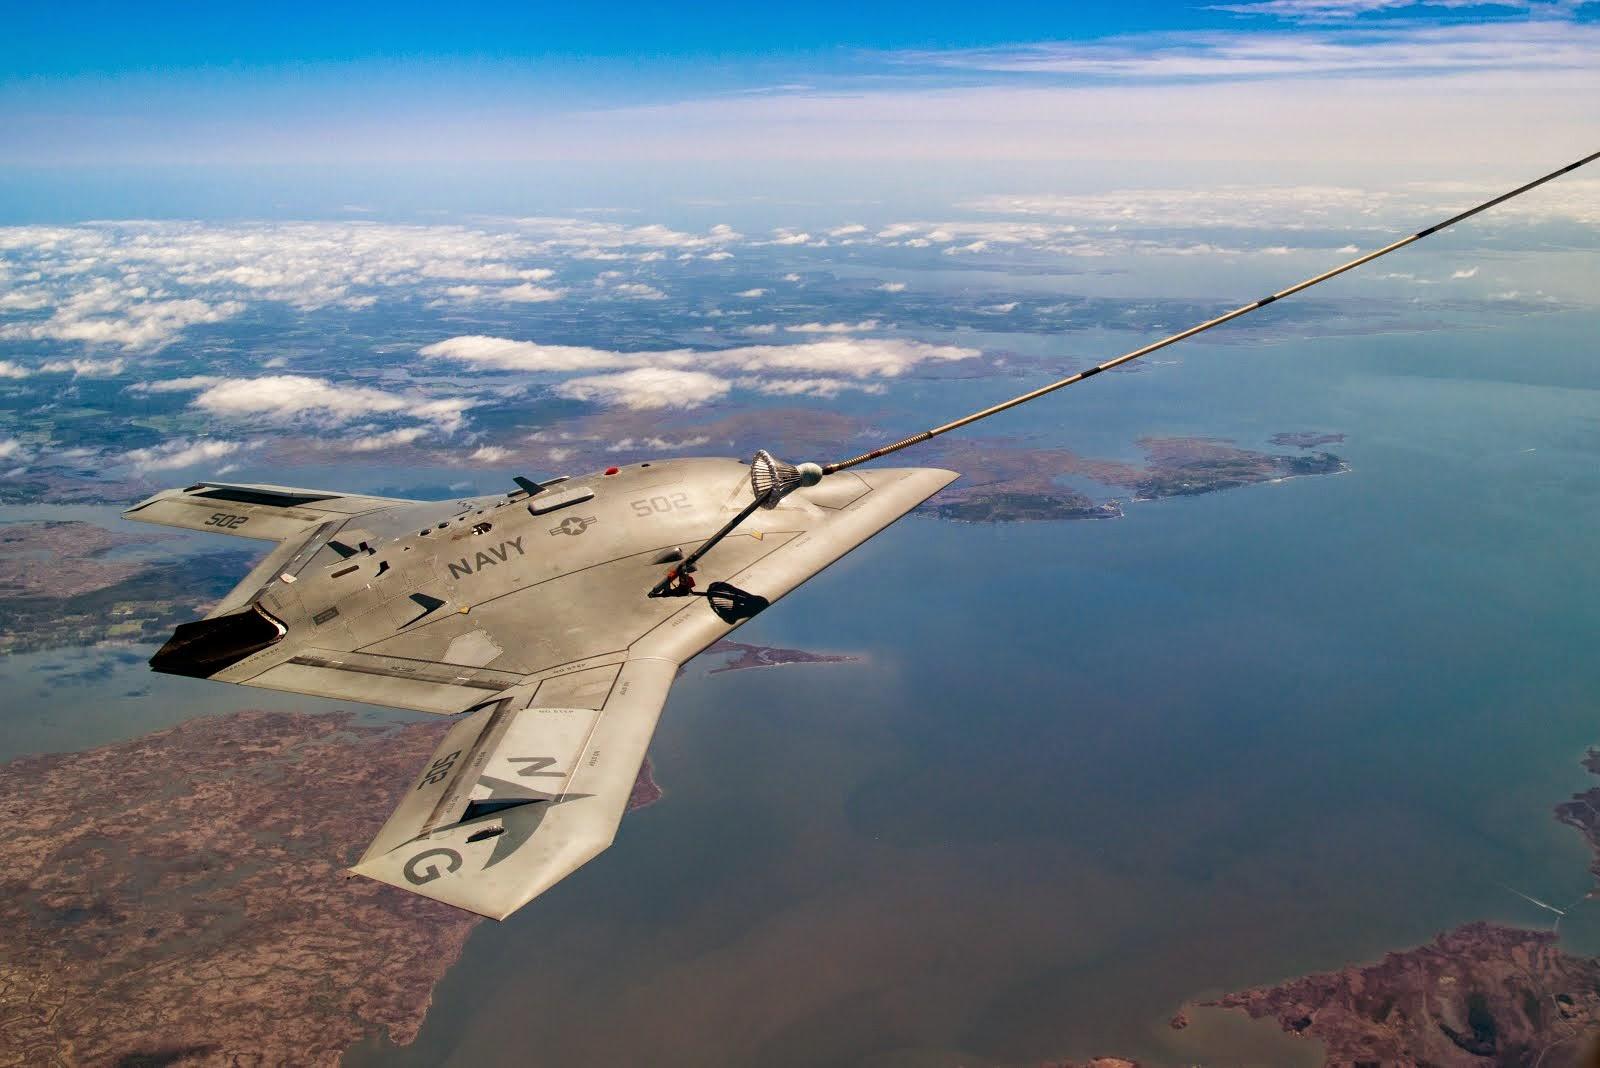 X-47B refueling